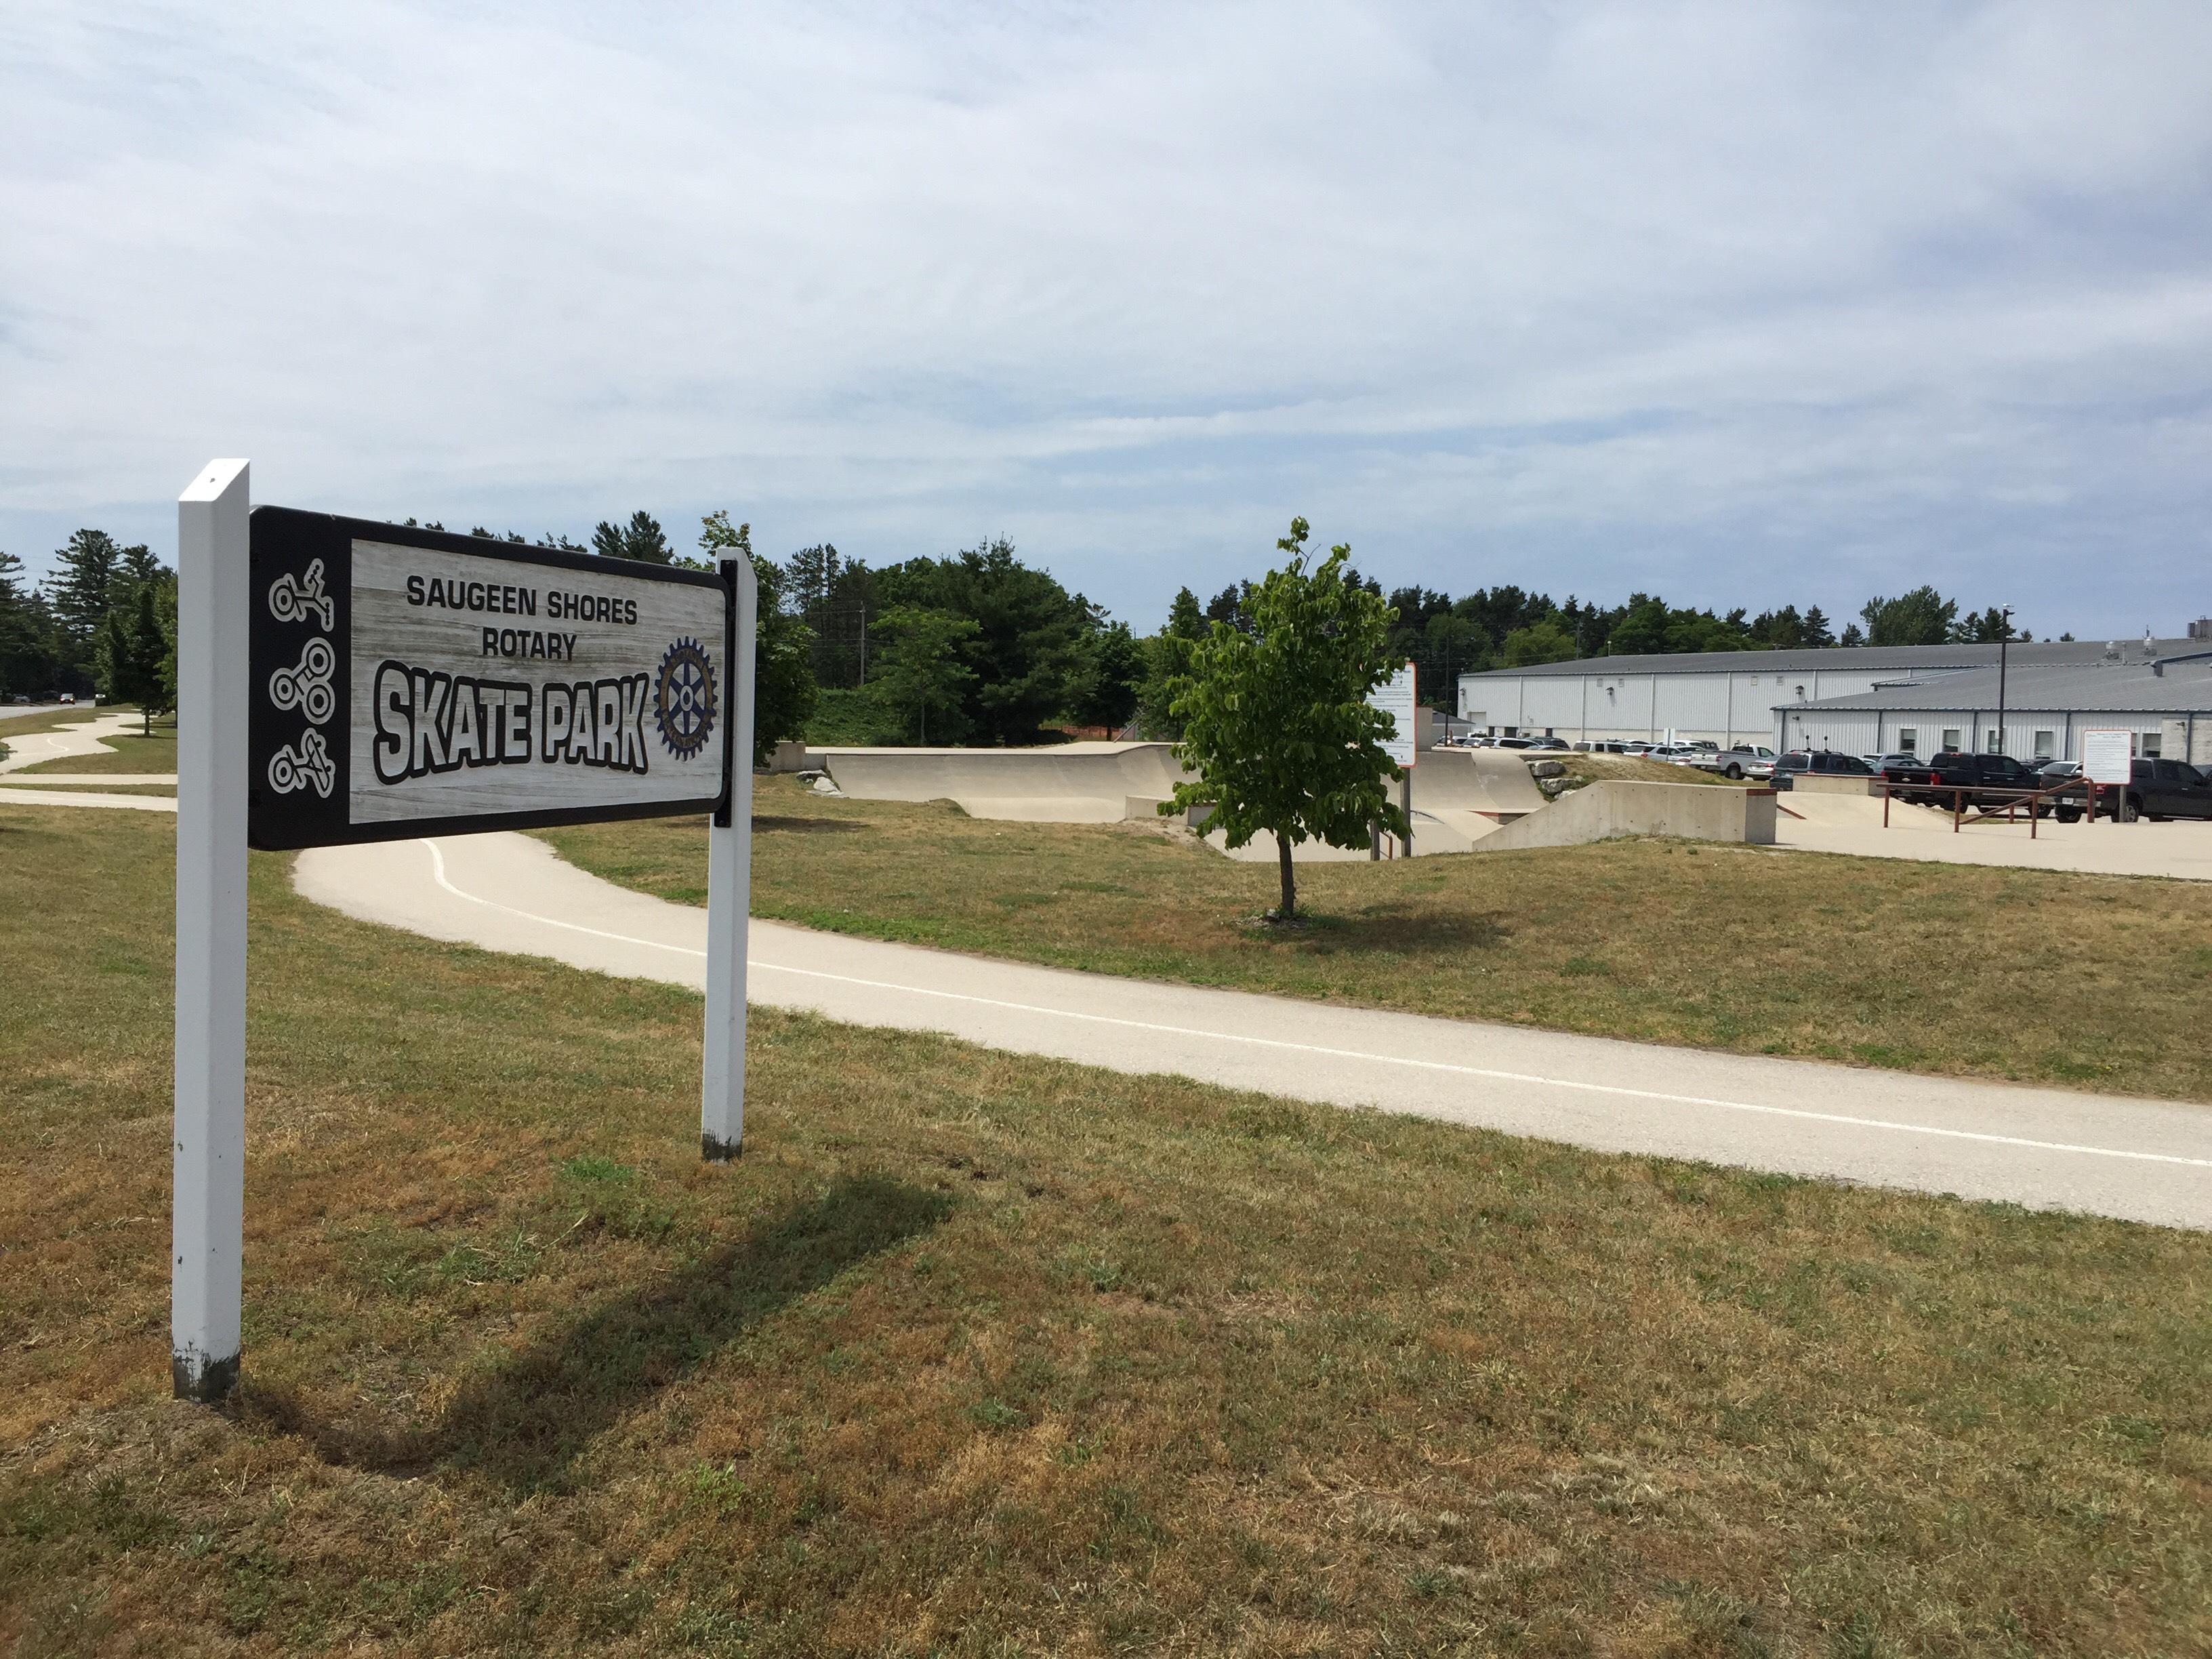 Saugeen Shores Rotary Skate Park